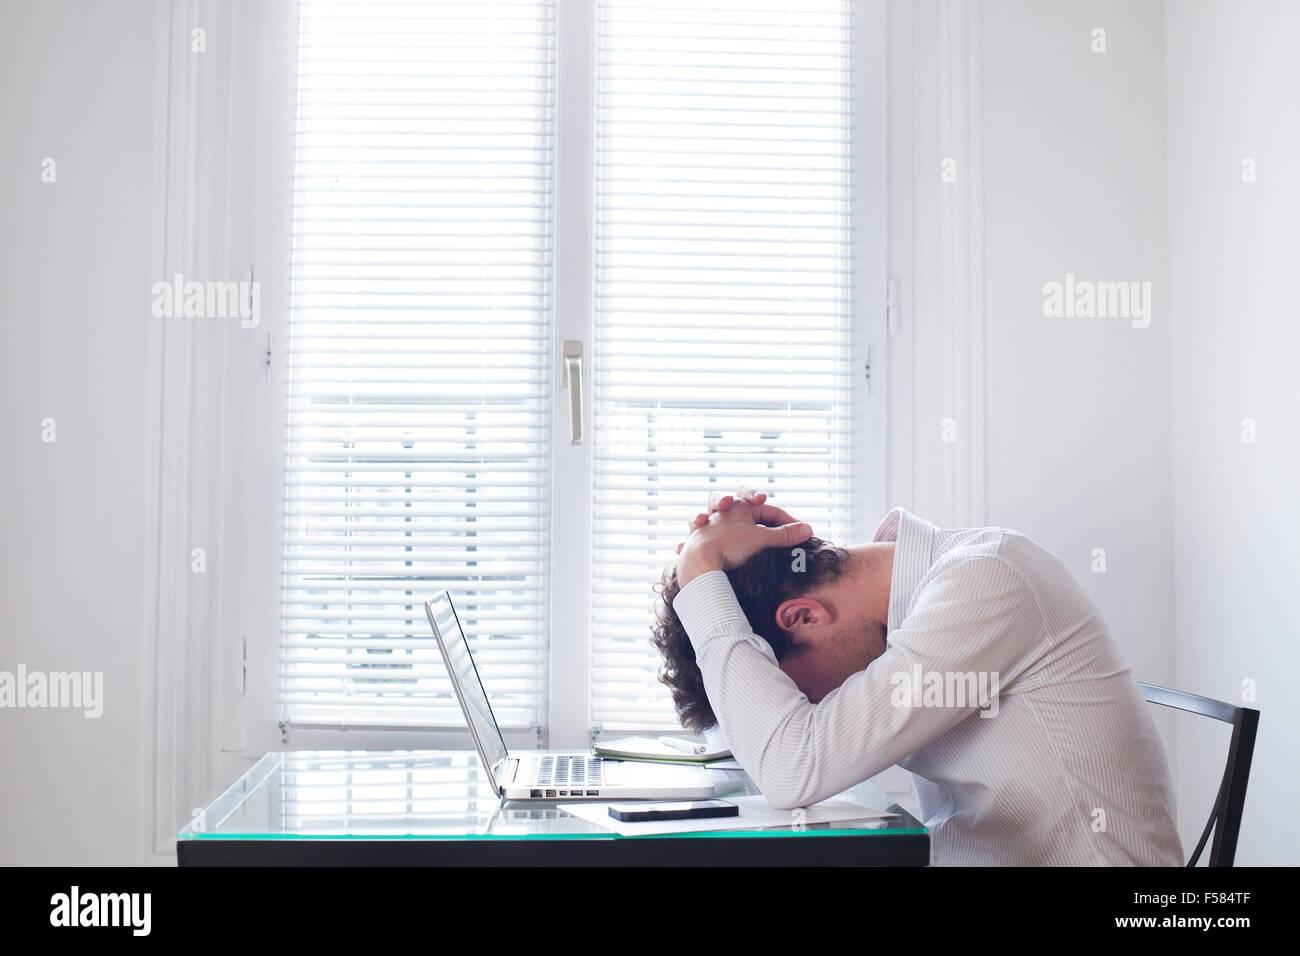 stress at work - Stock Image